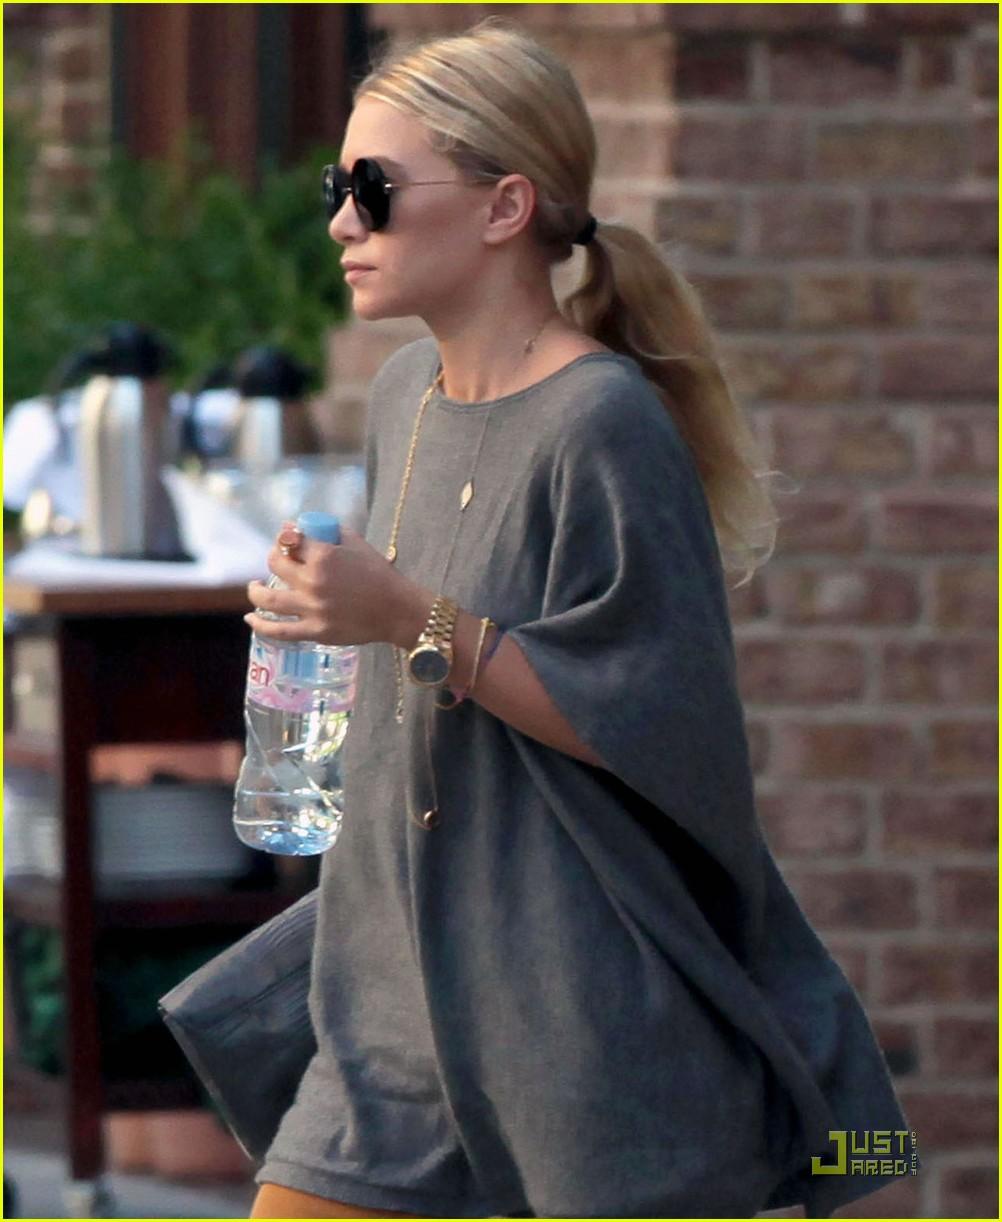 Mary-Kate and Ashley Olsen: Splashing in a Kiddie Pool!